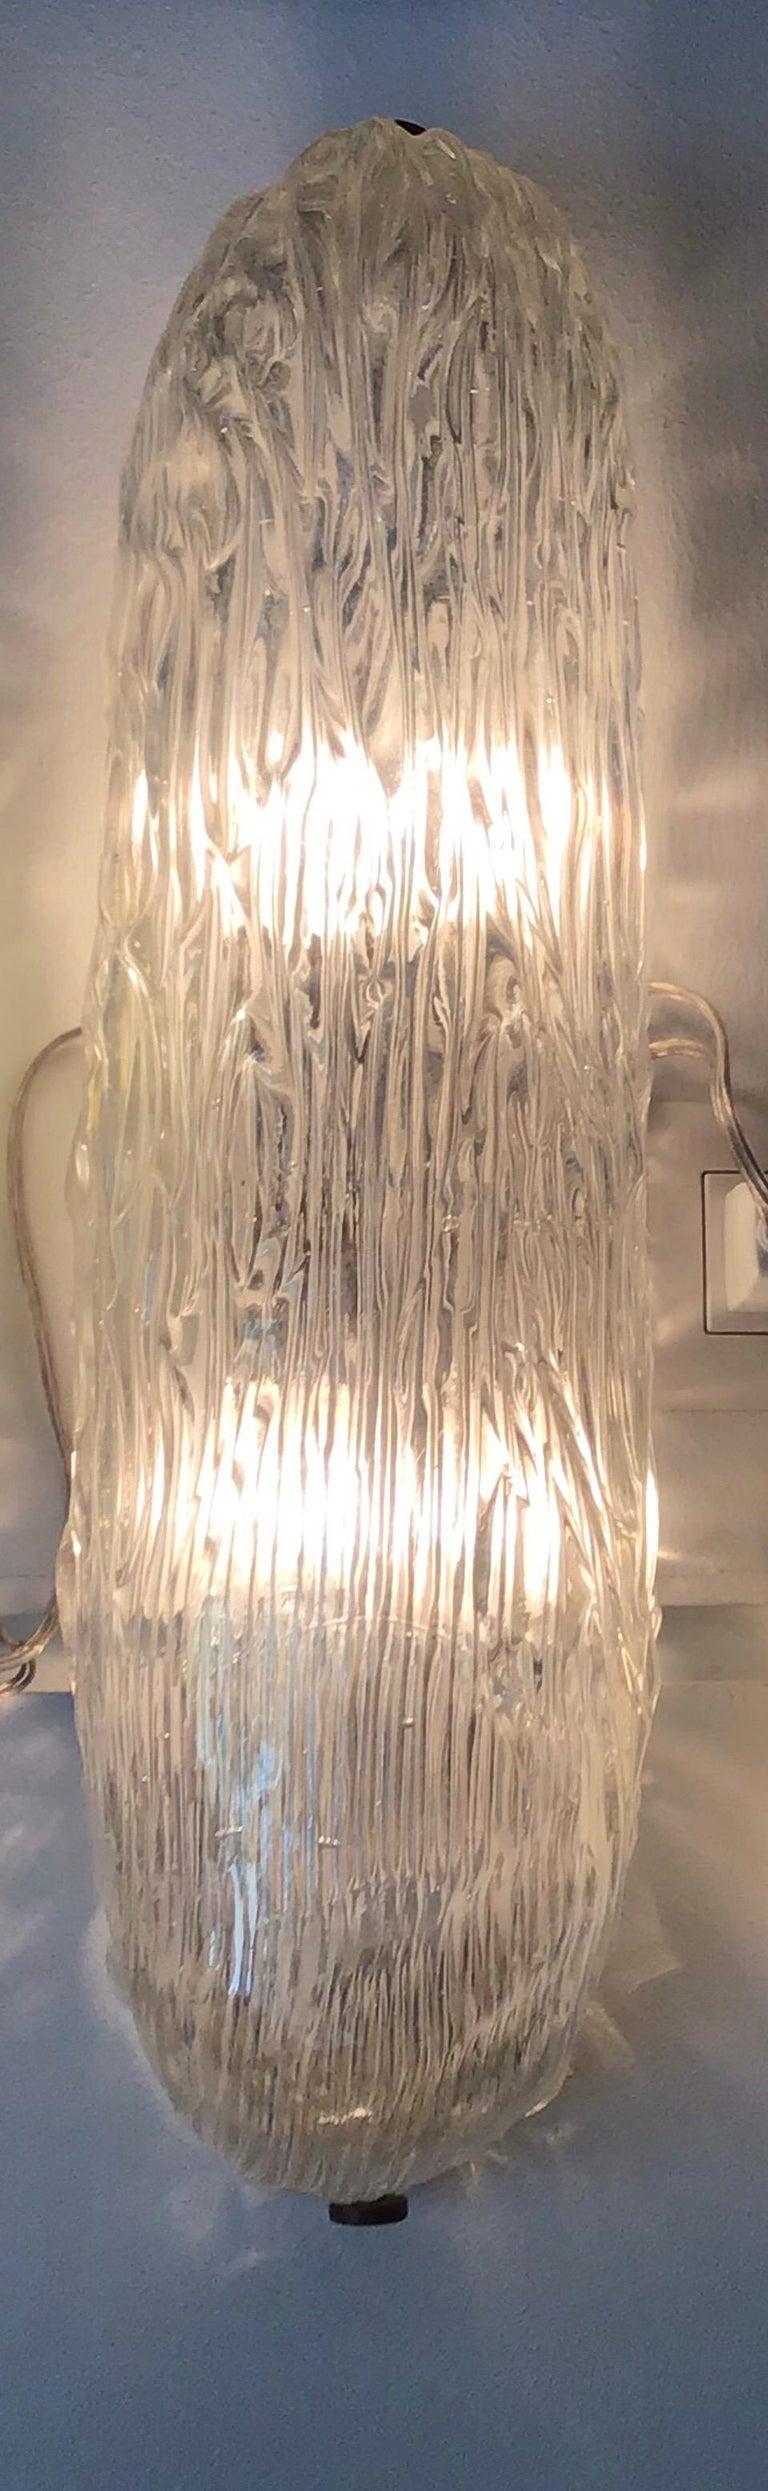 Venini Sconces/Ceiling Light Murano Glass Brass, 1950, Italy For Sale 4